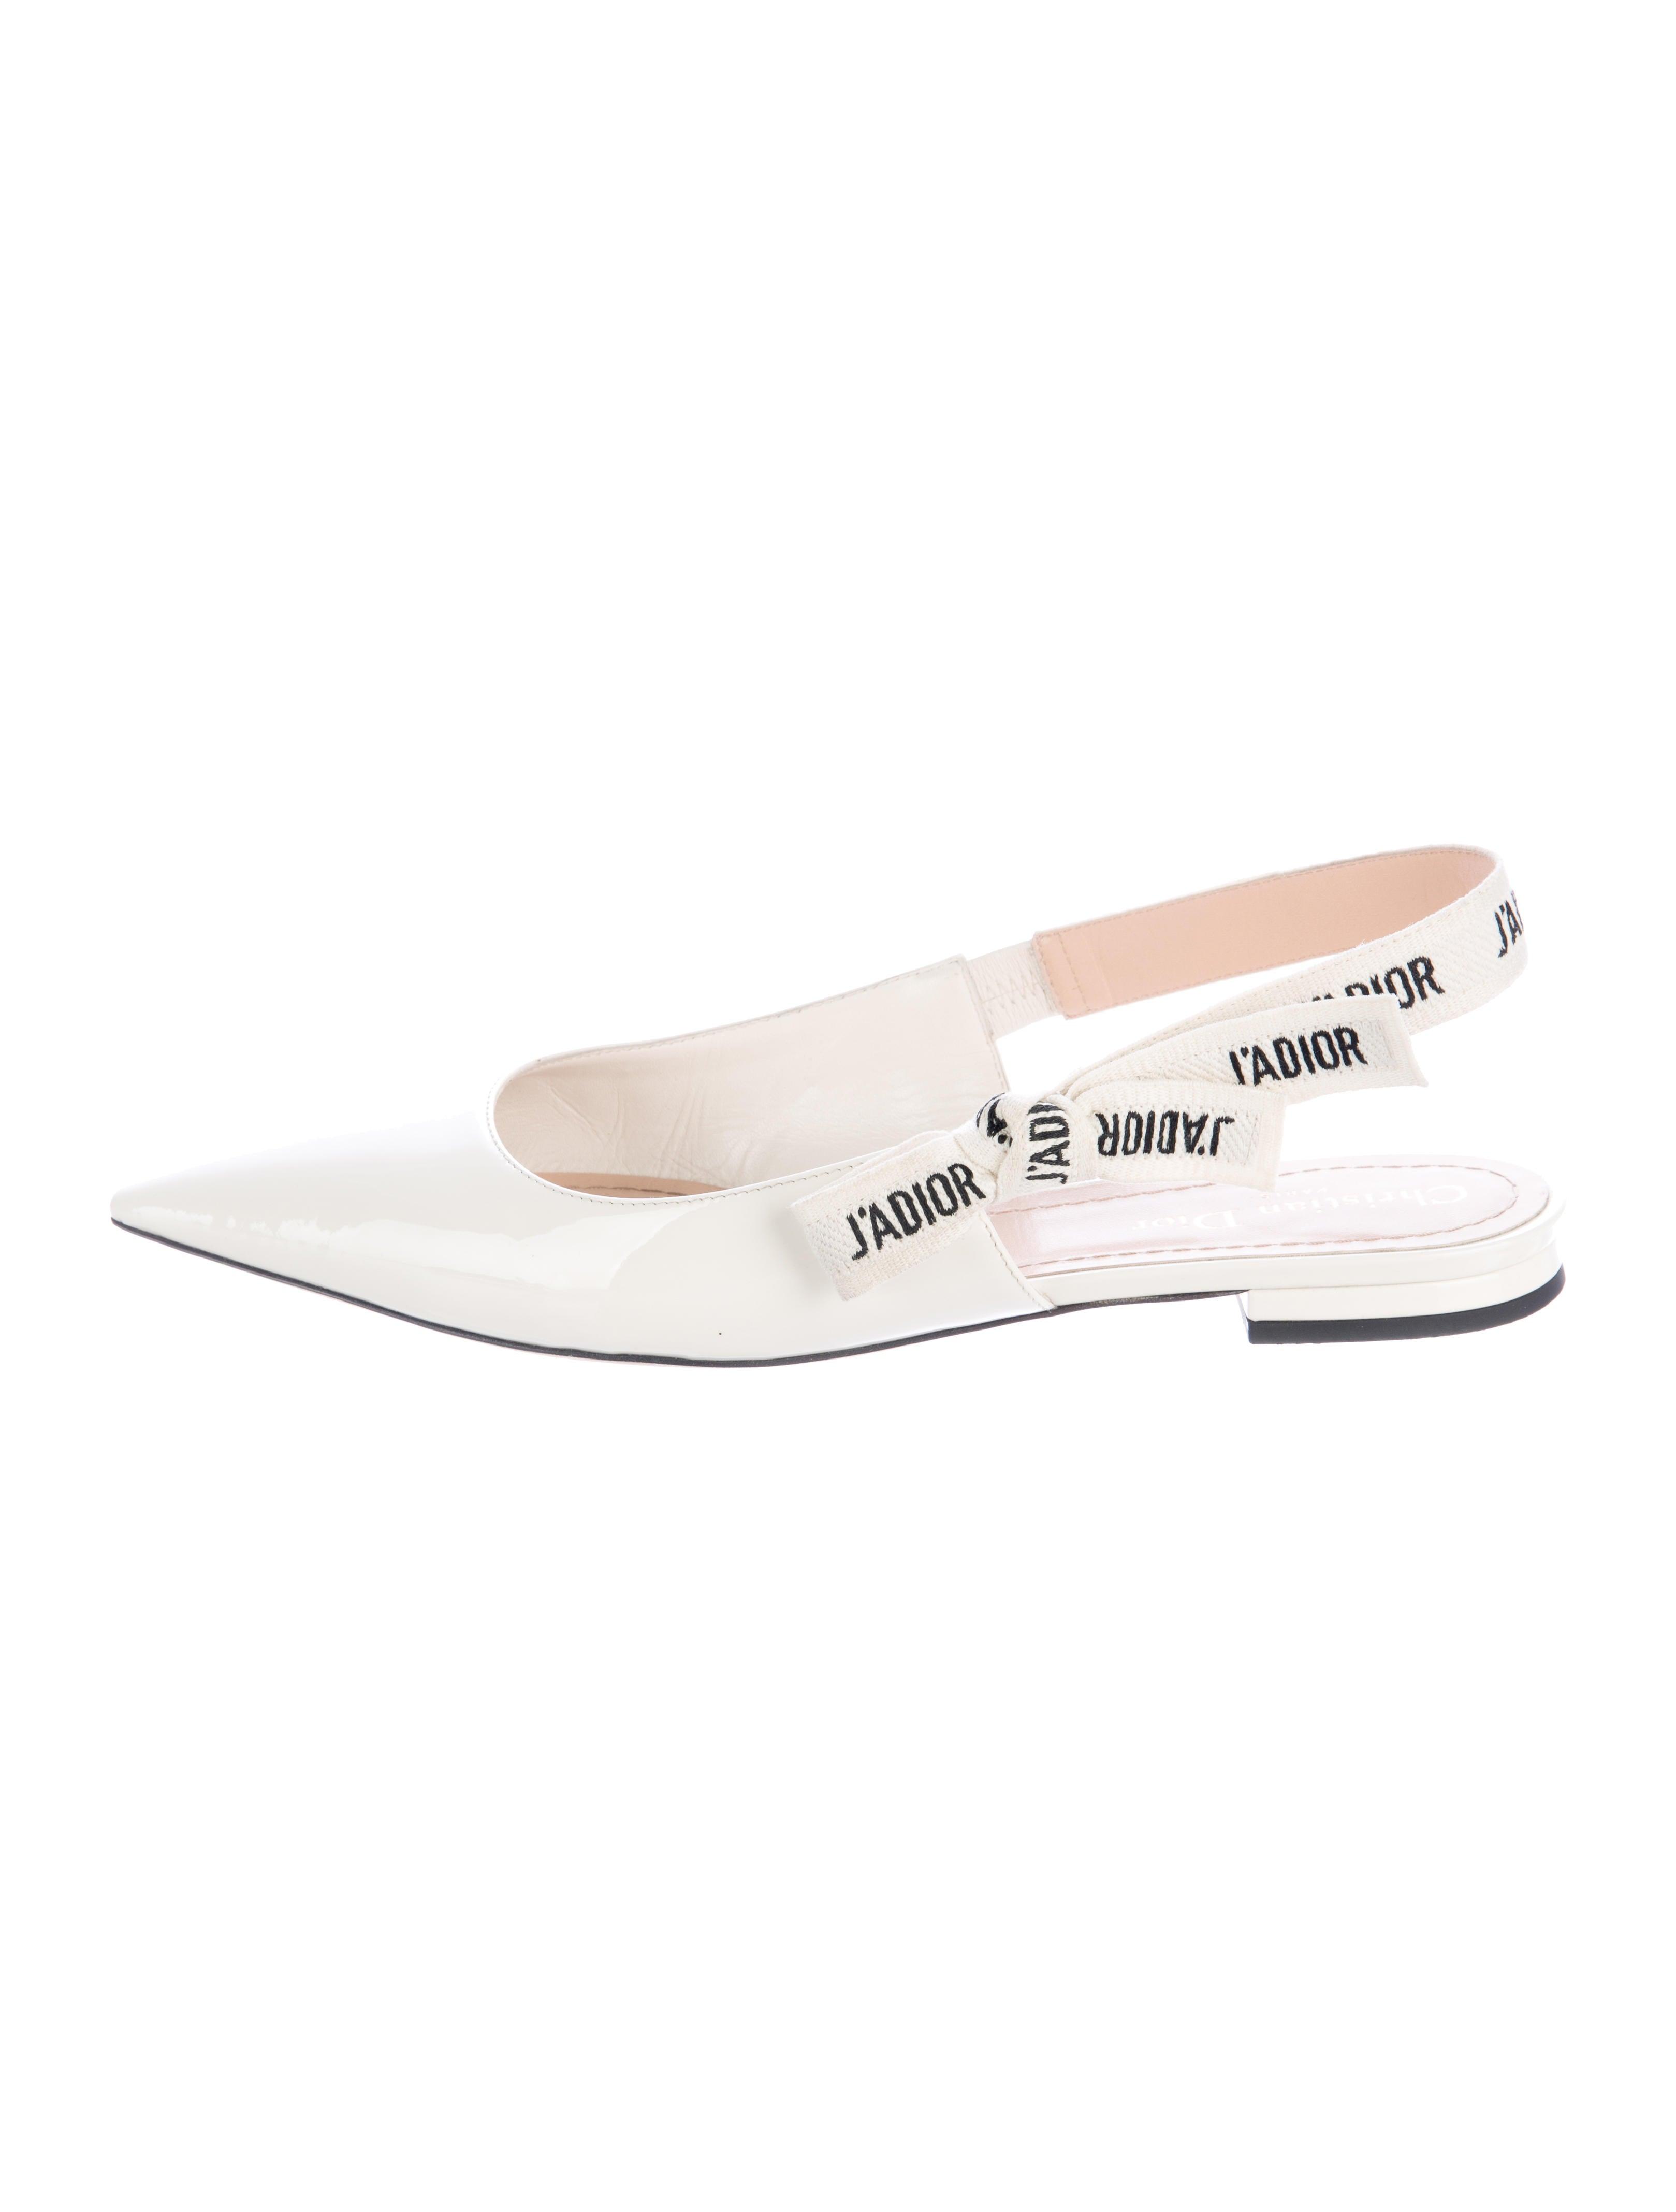 45d1a034b5 Christian Dior 2017 J'adior Slingback Flats - Shoes - CHR58441 | The ...